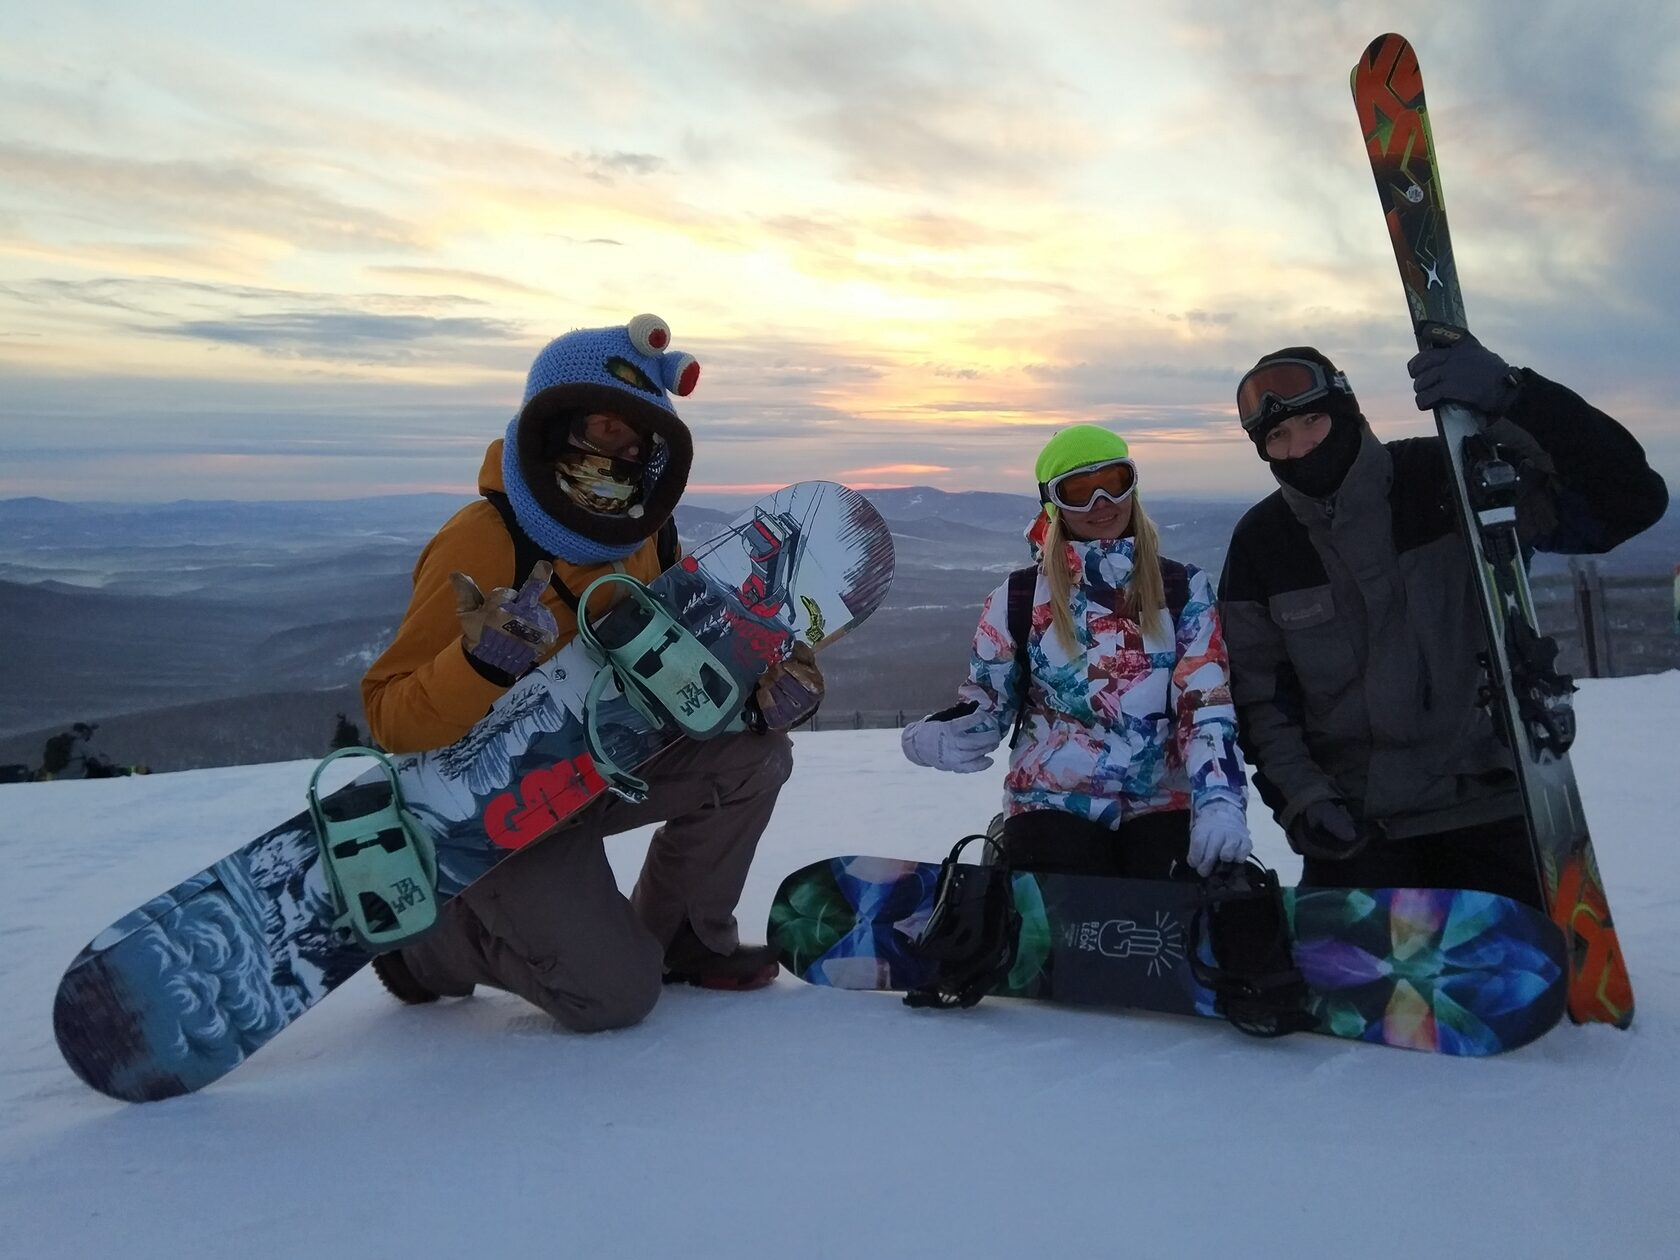 горнолыжные туры 2021